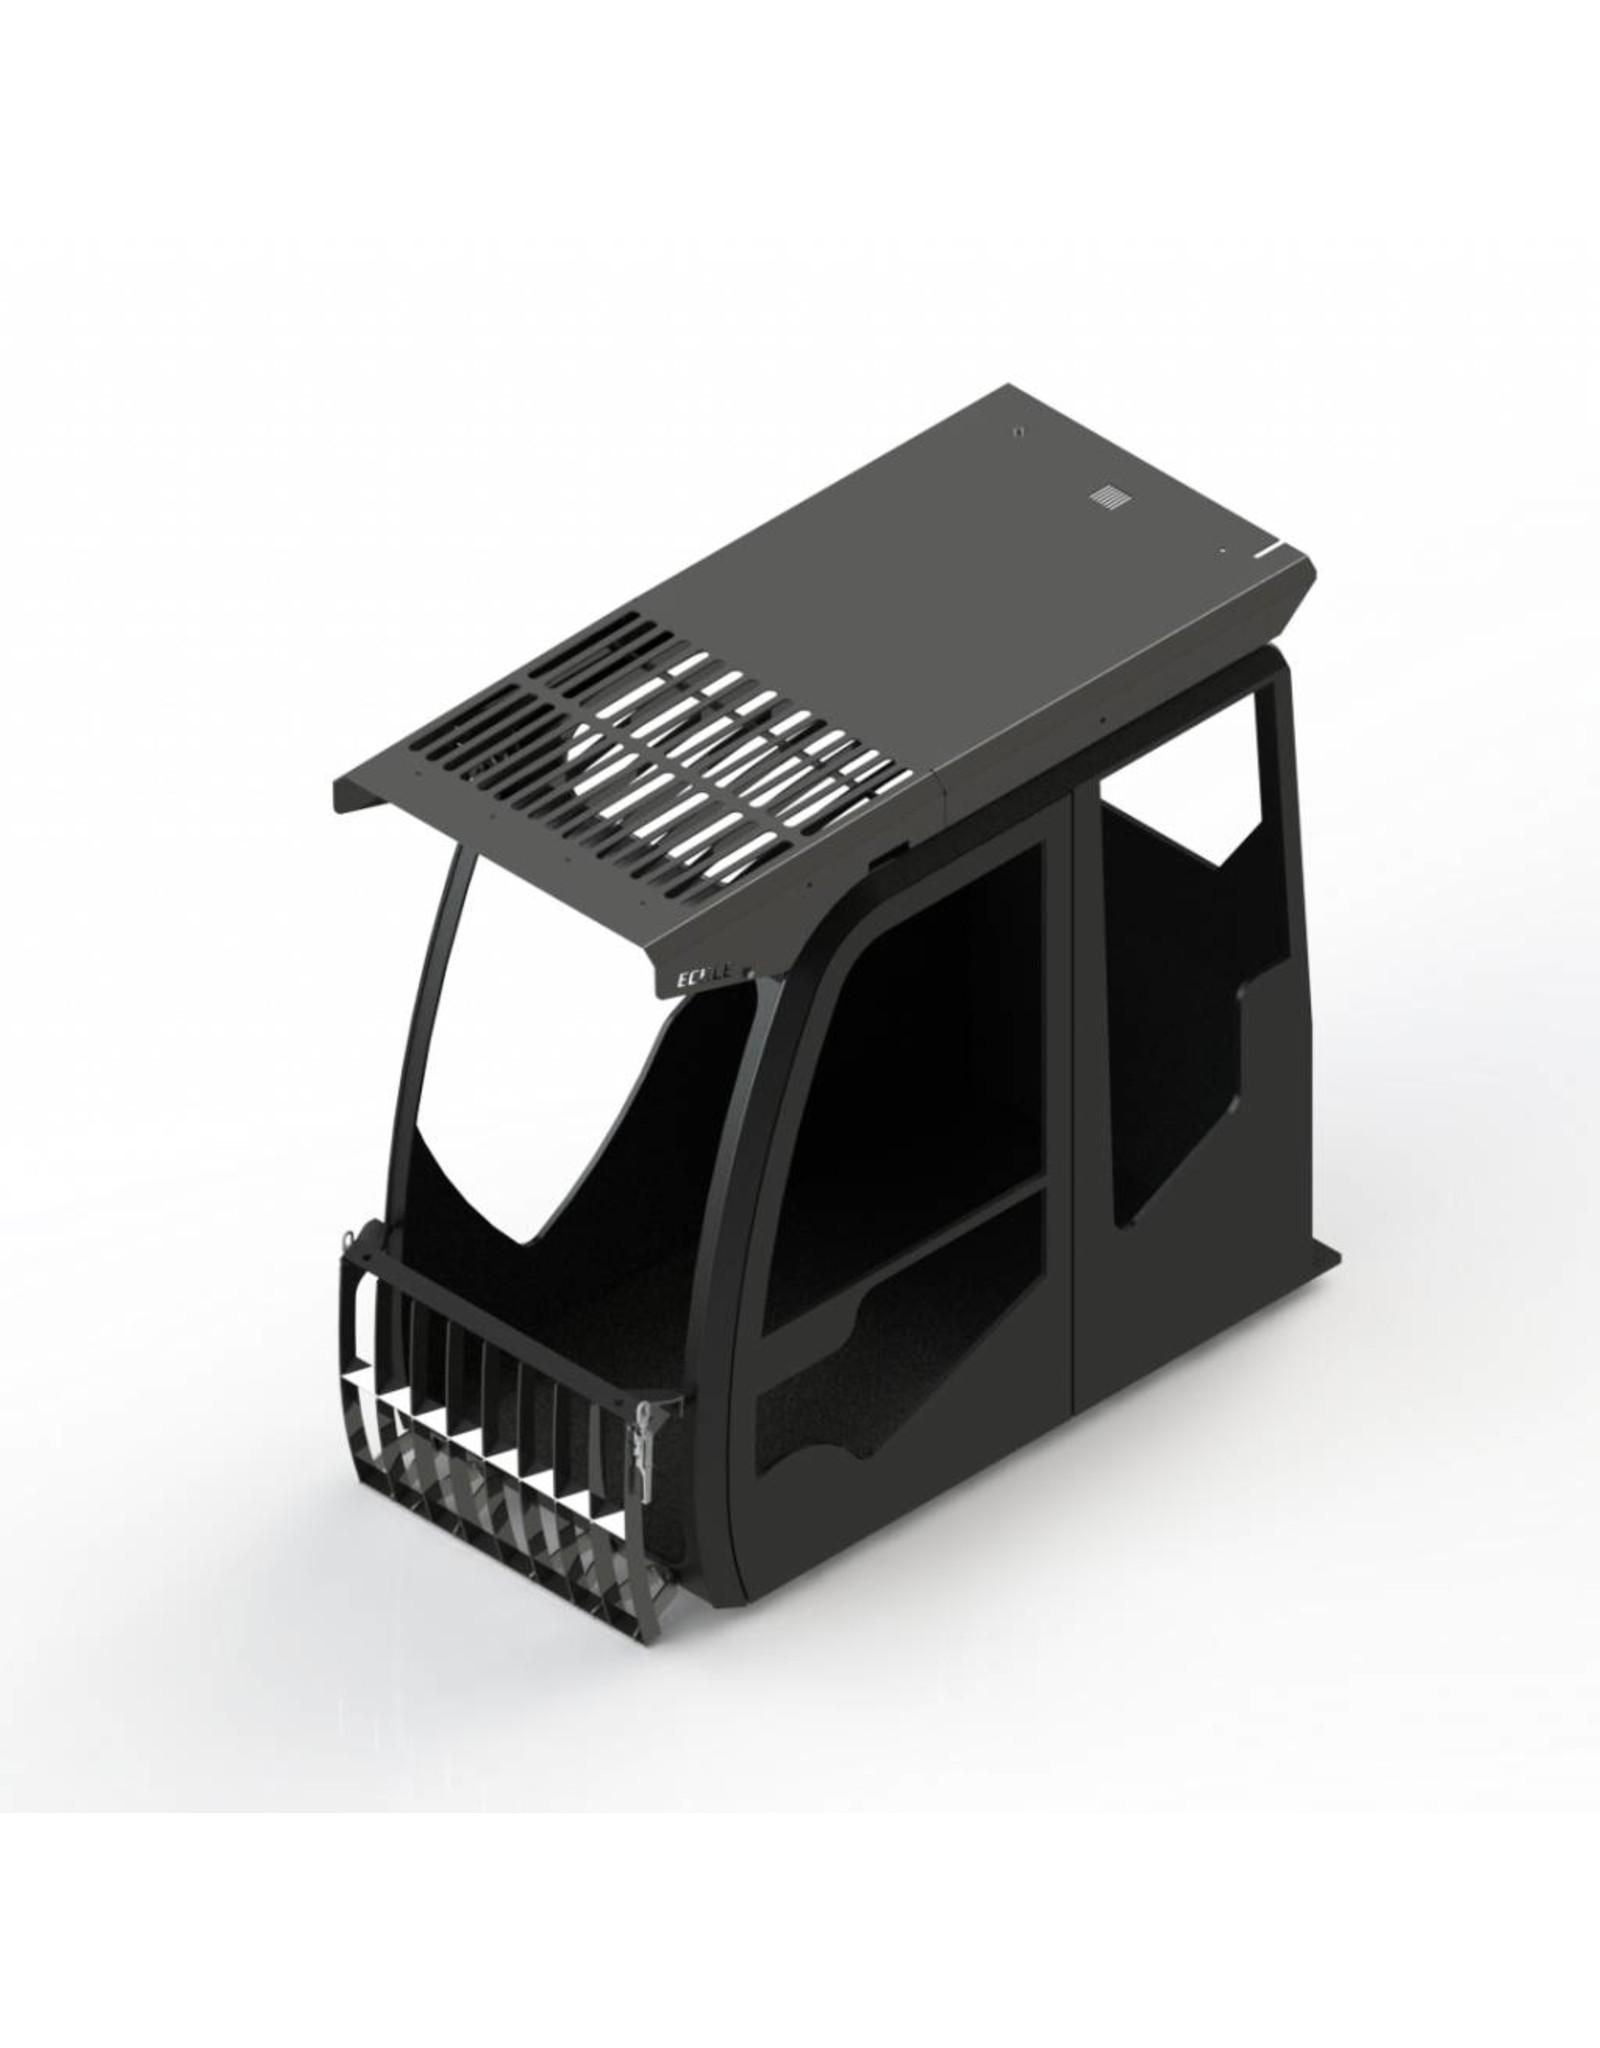 Echle Hartstahl GmbH FOPS für Doosan DX180LC-5